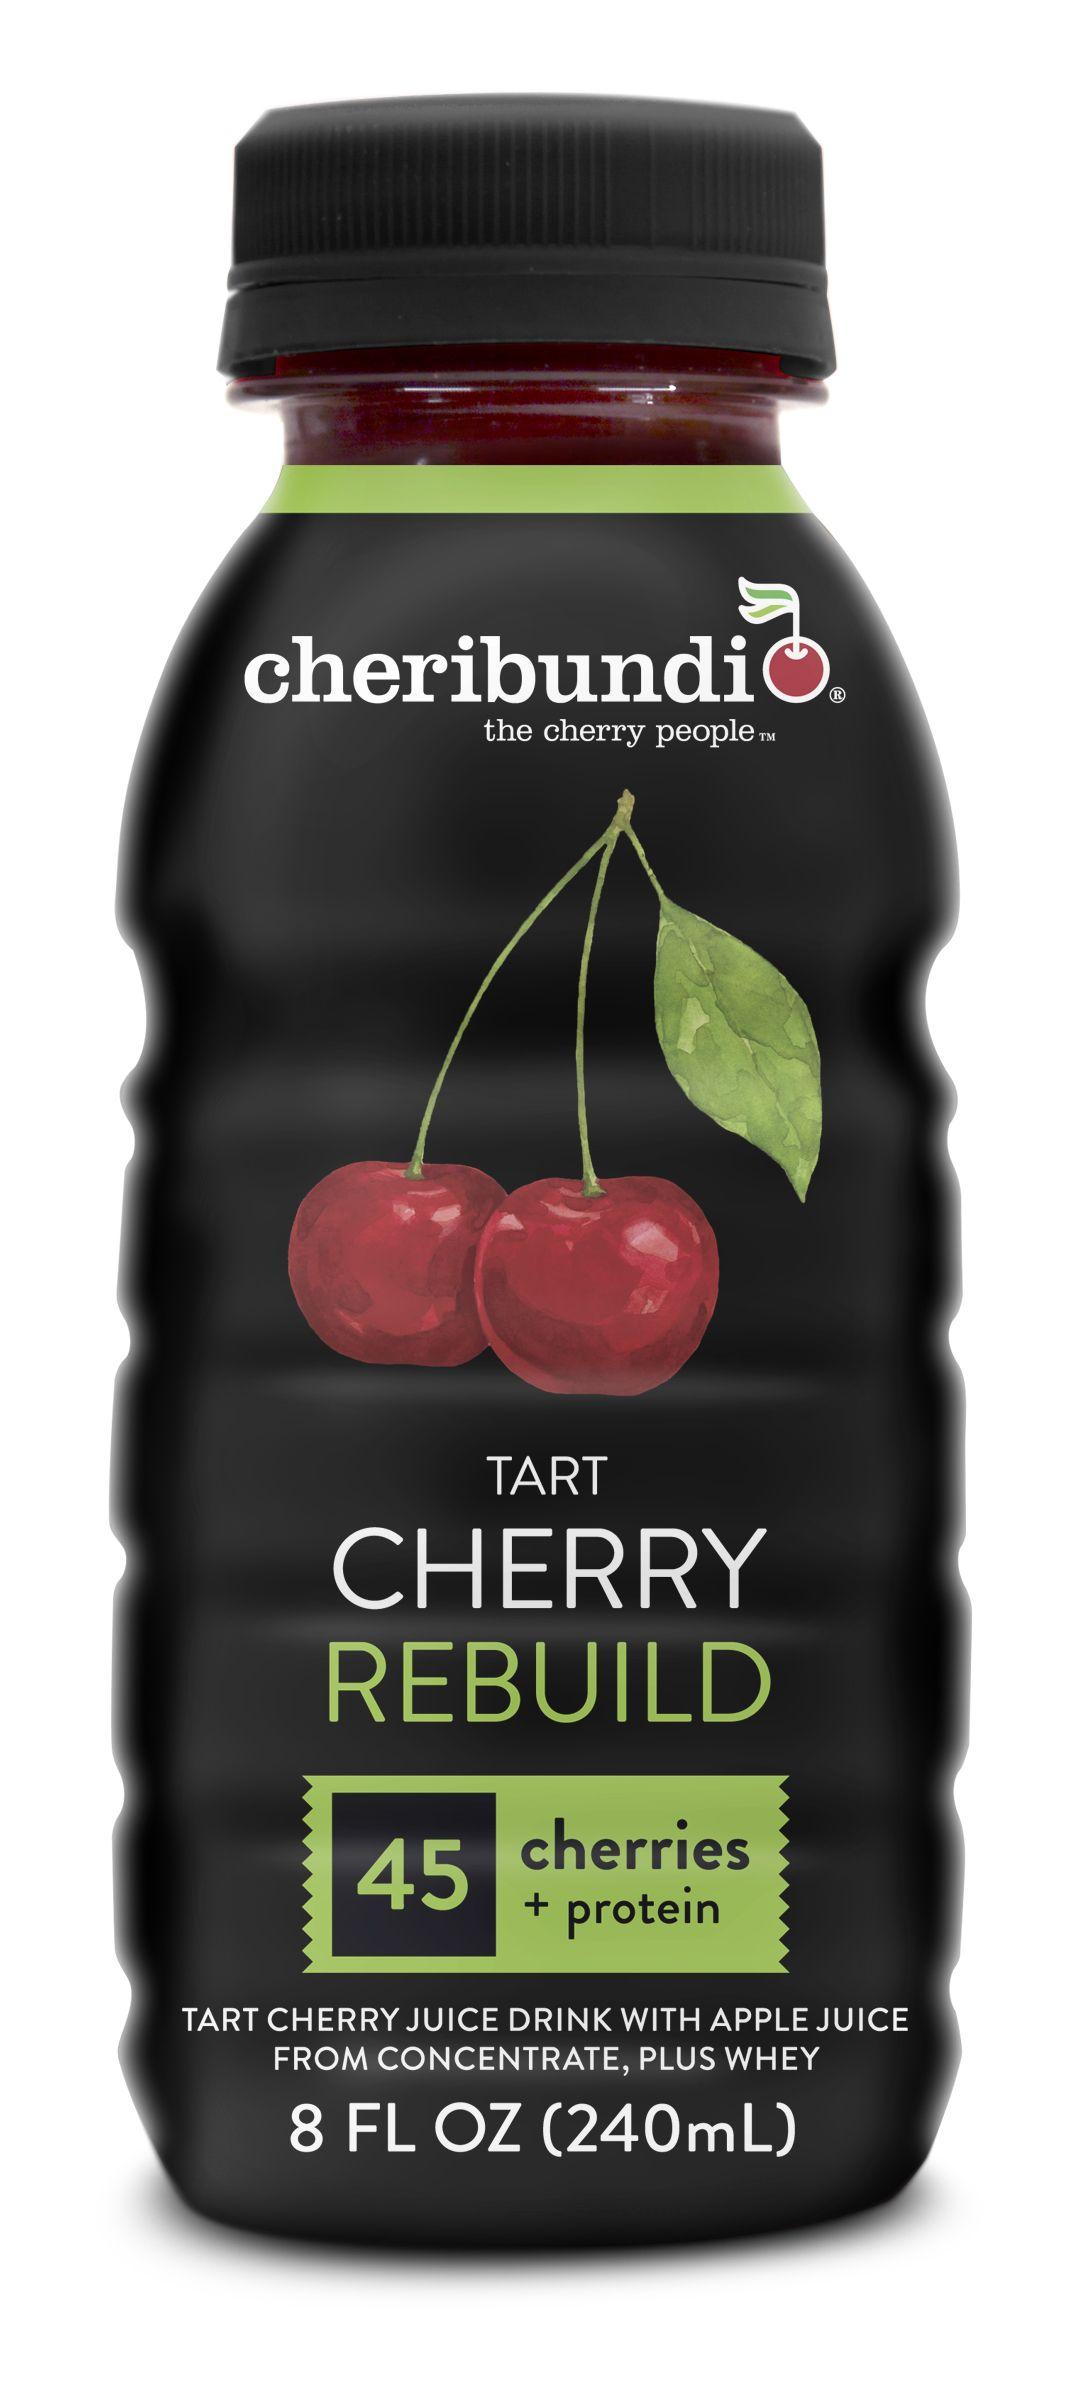 Cheribundi Tart Cherry REBUILD with 8 grams of whey protein